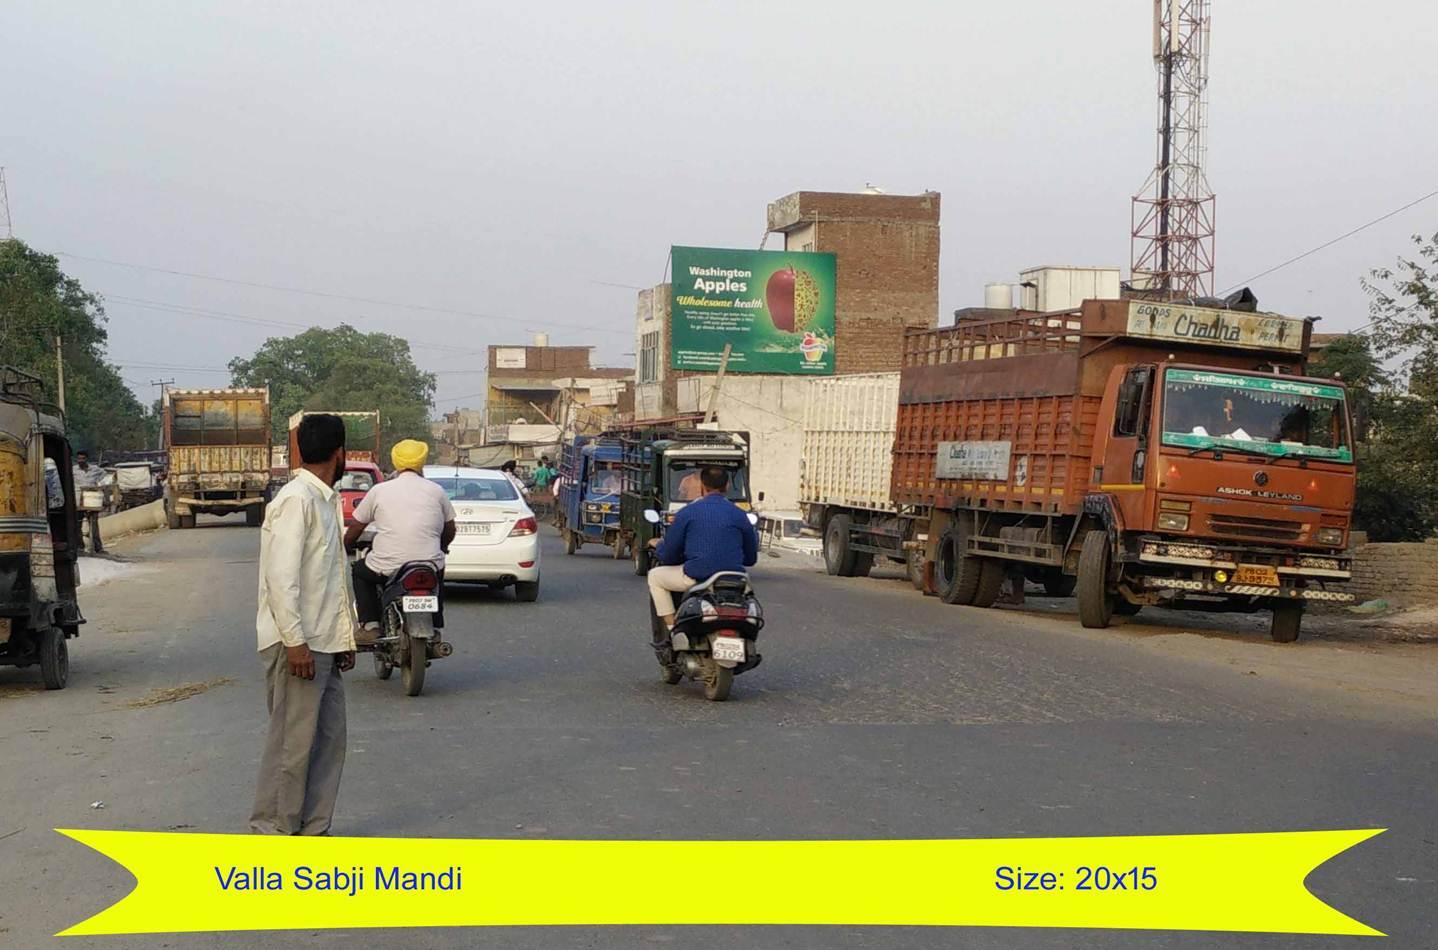 Wholesale Vegetable & Fruit Market, Amritsar